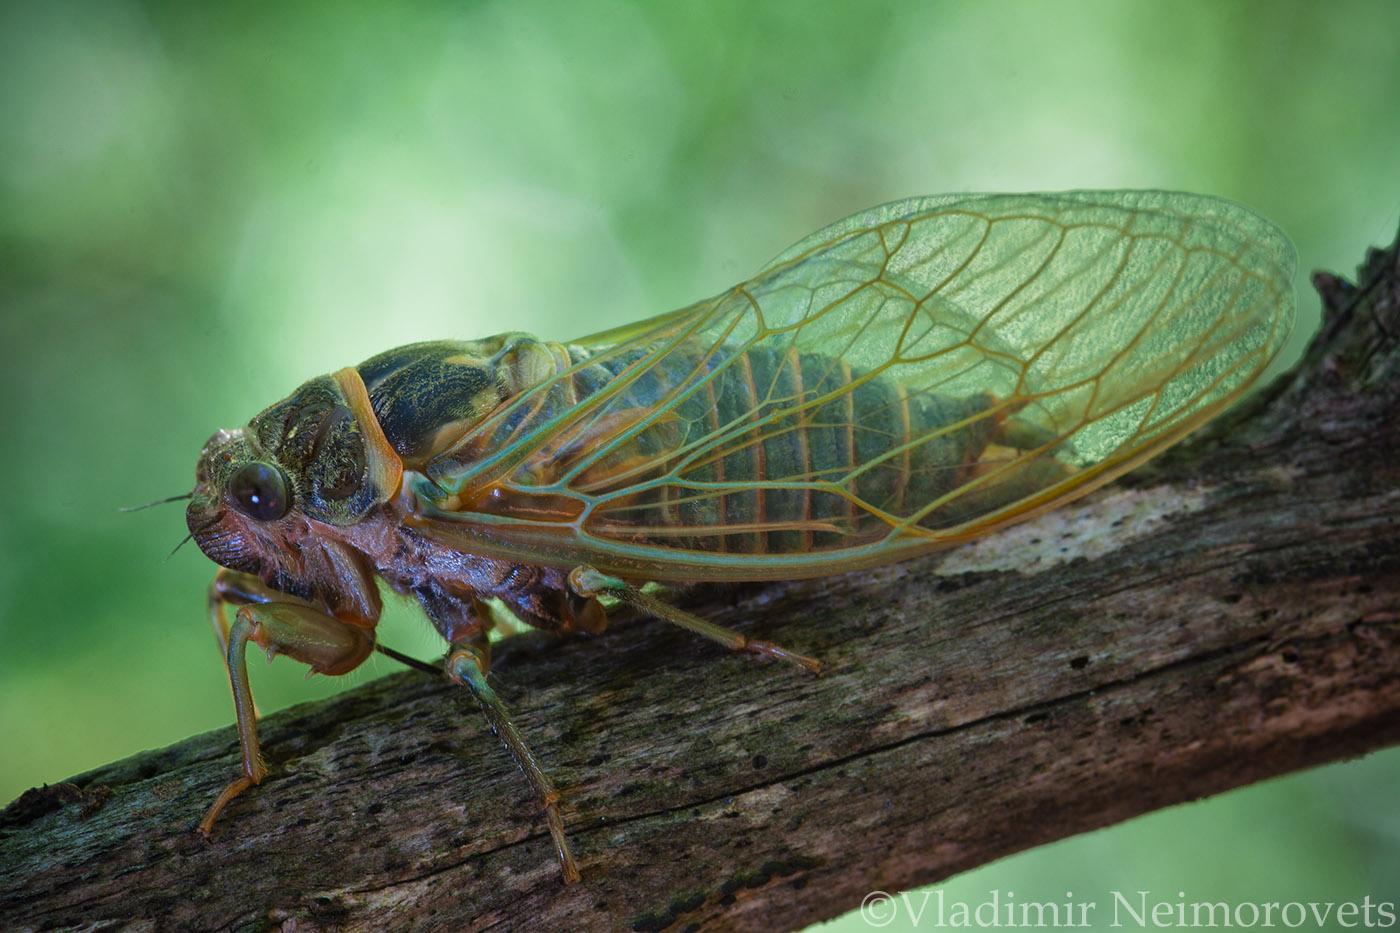 Lyristes plebejus_Krasnodar Territory_North-Western Caucasus_common cicada_Cicada plebeian